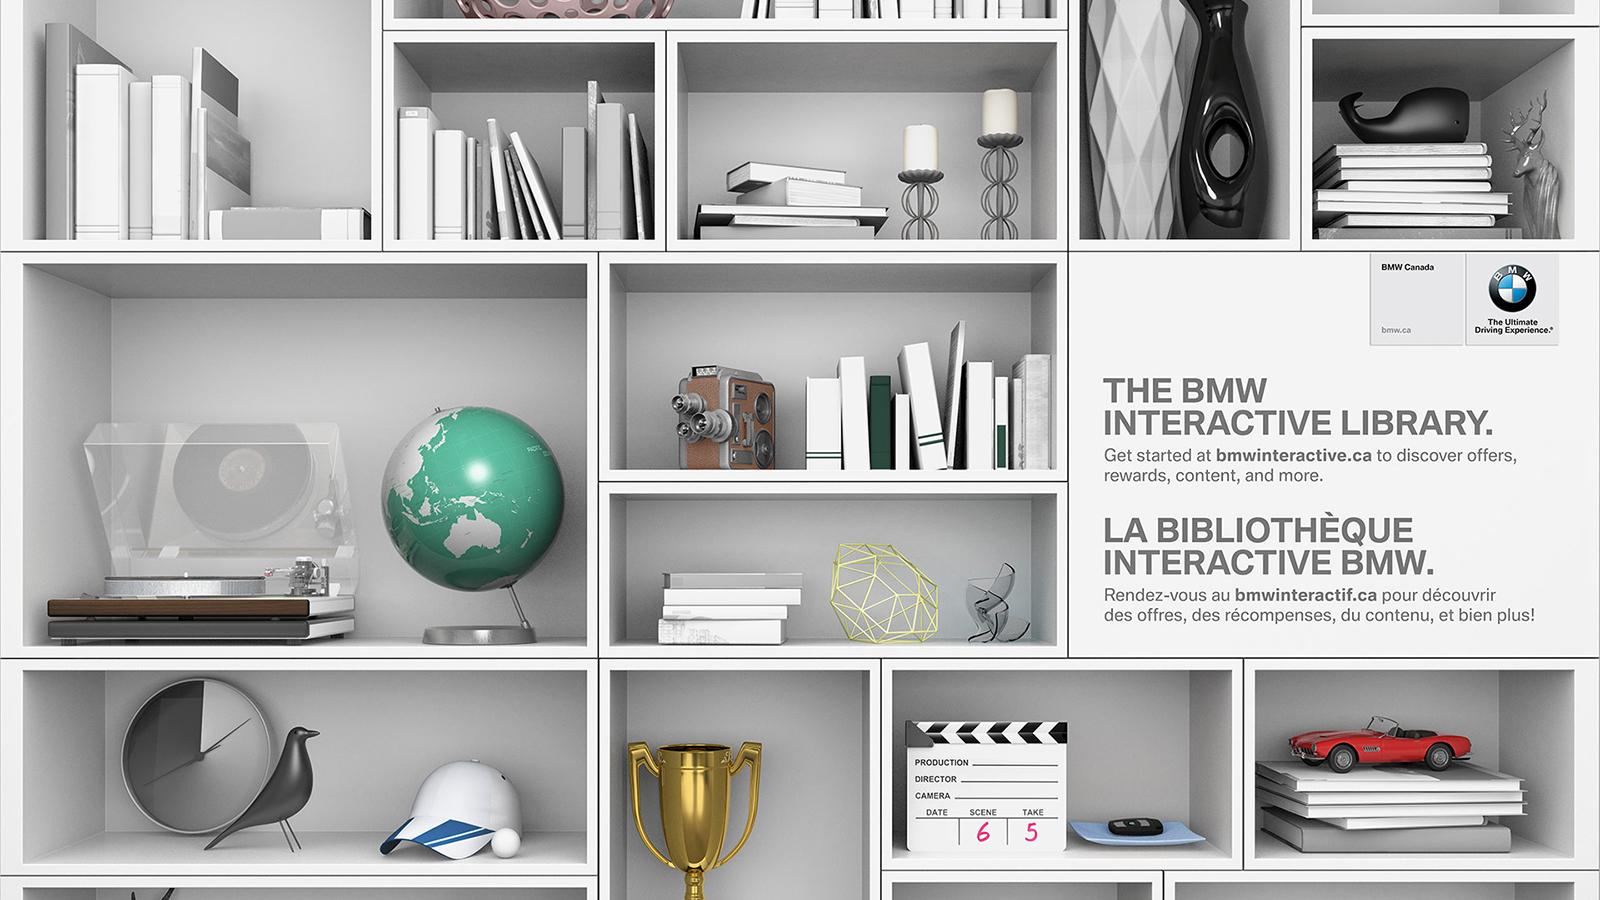 BMW Canada | BMW Interactive Wall | App Development, Augmented Reality, Design, Digital Innovation, Digital Marketing, Experiential, Mobile, Website Design & Development